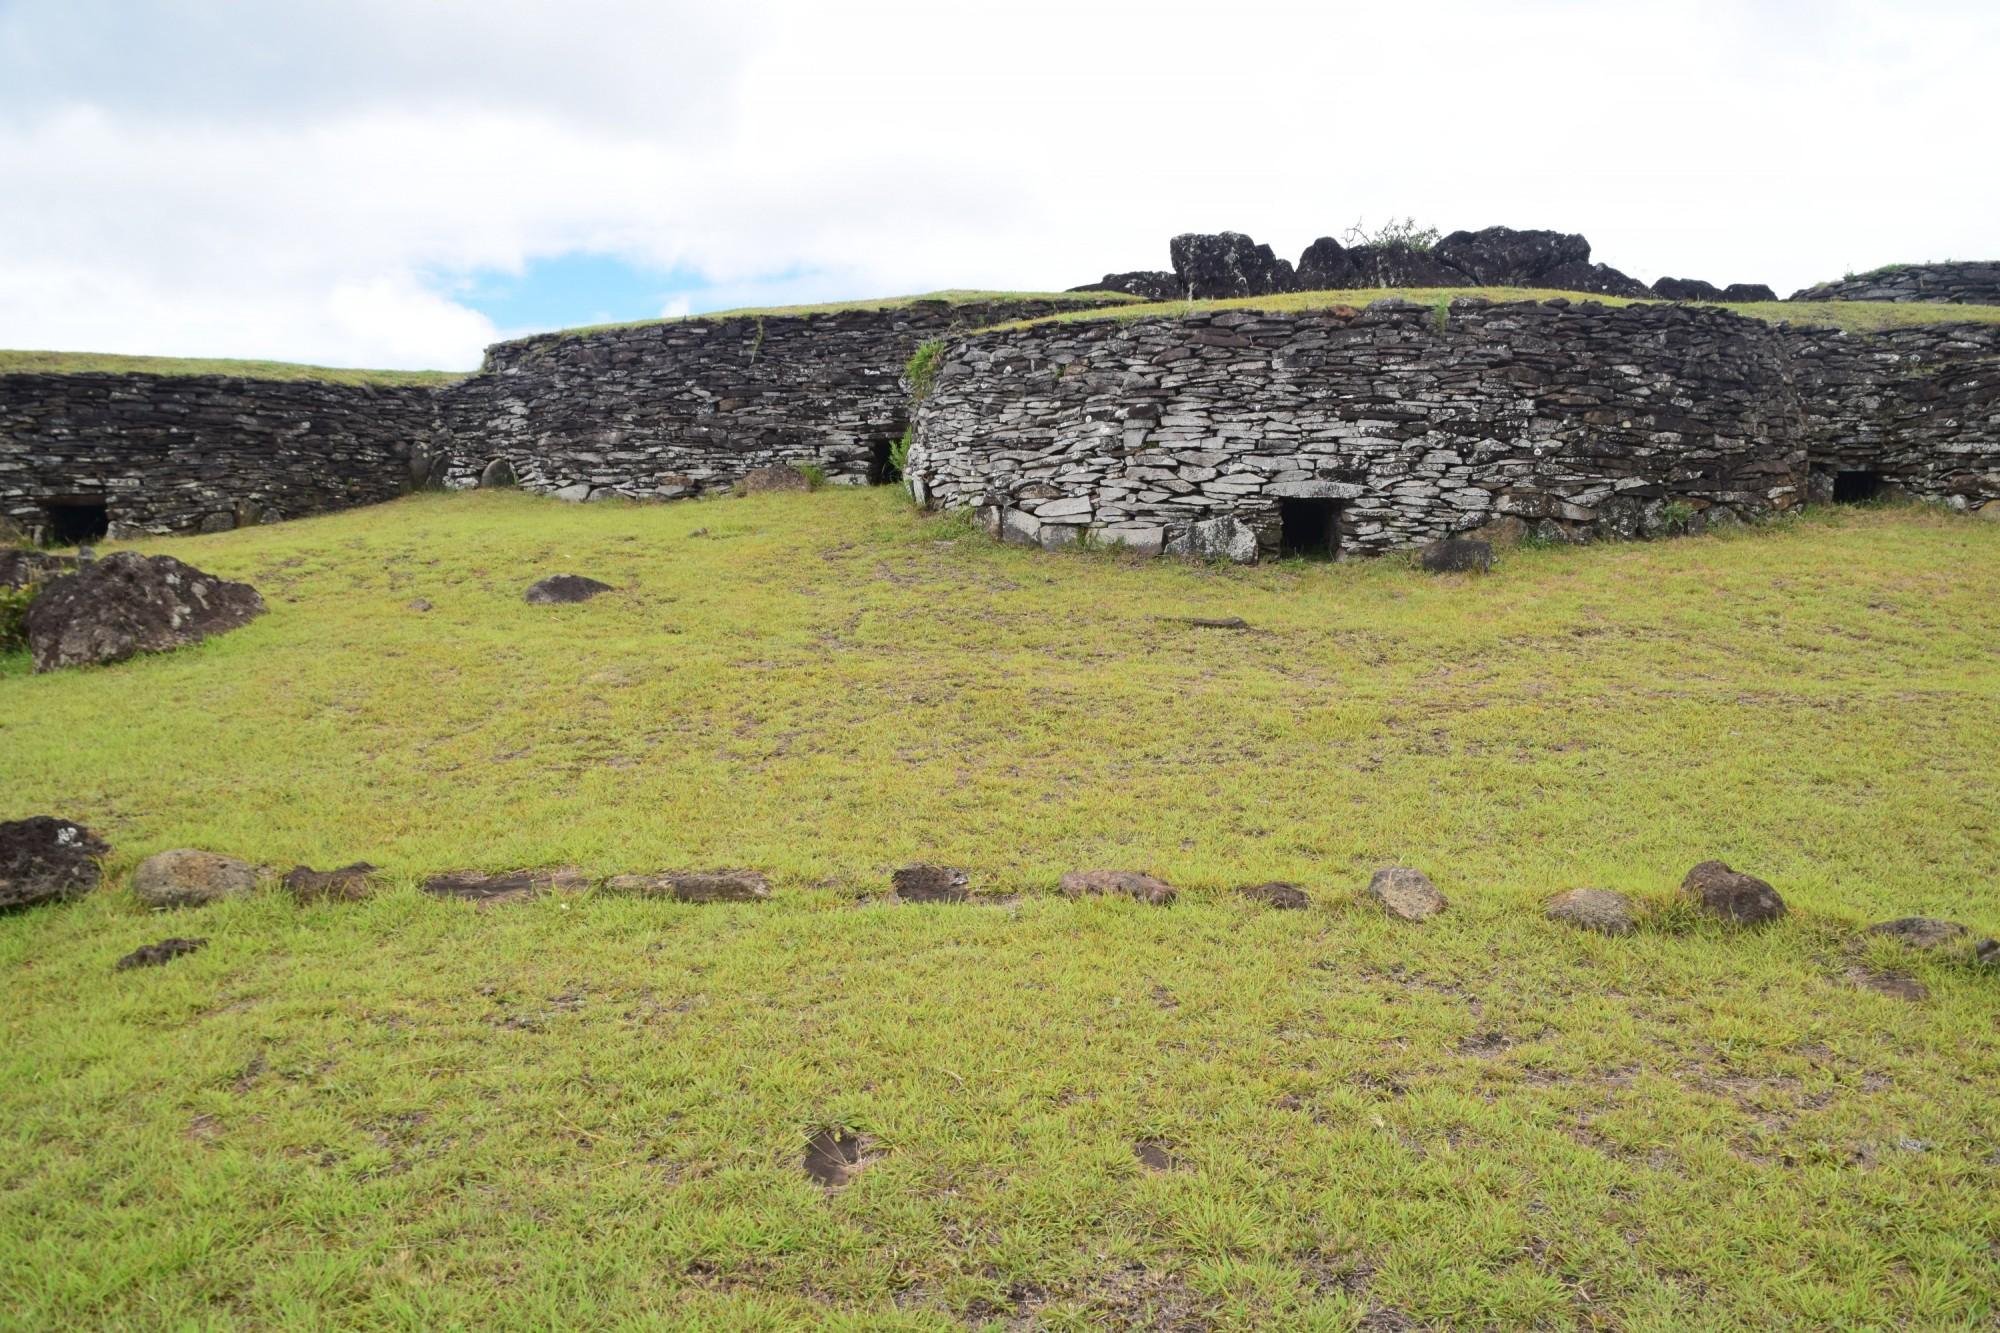 Hare Paenga, Village d'Orongo